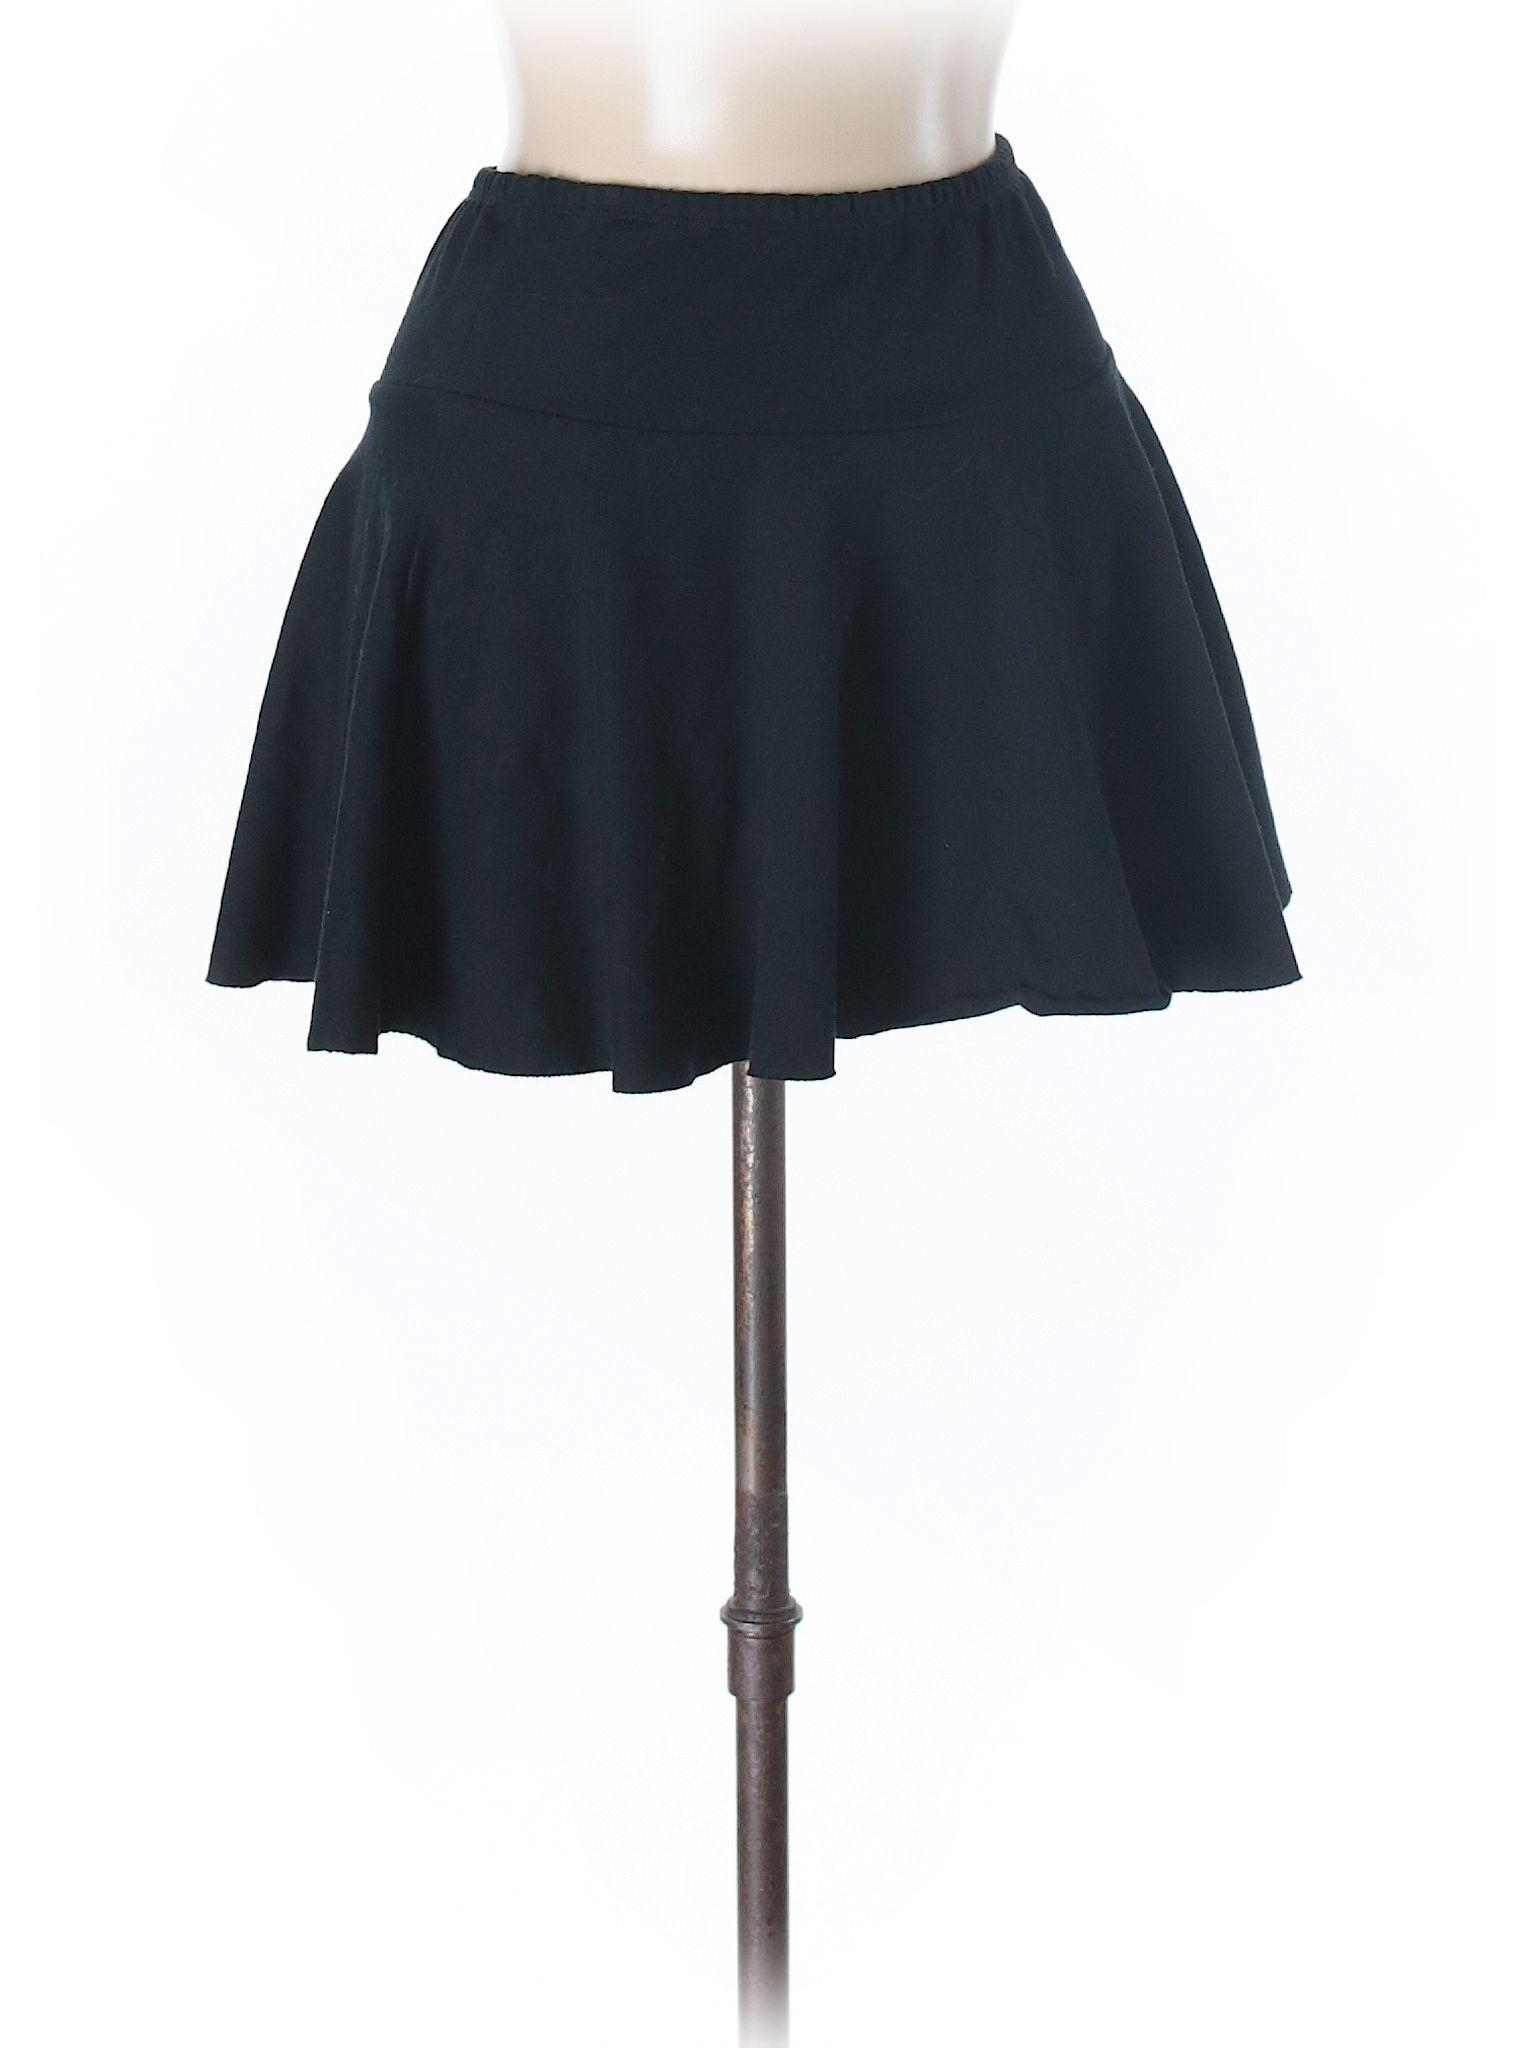 8e6b22b5fb0c7 Casual Skirt | Products | Skirts, American apparel, Black